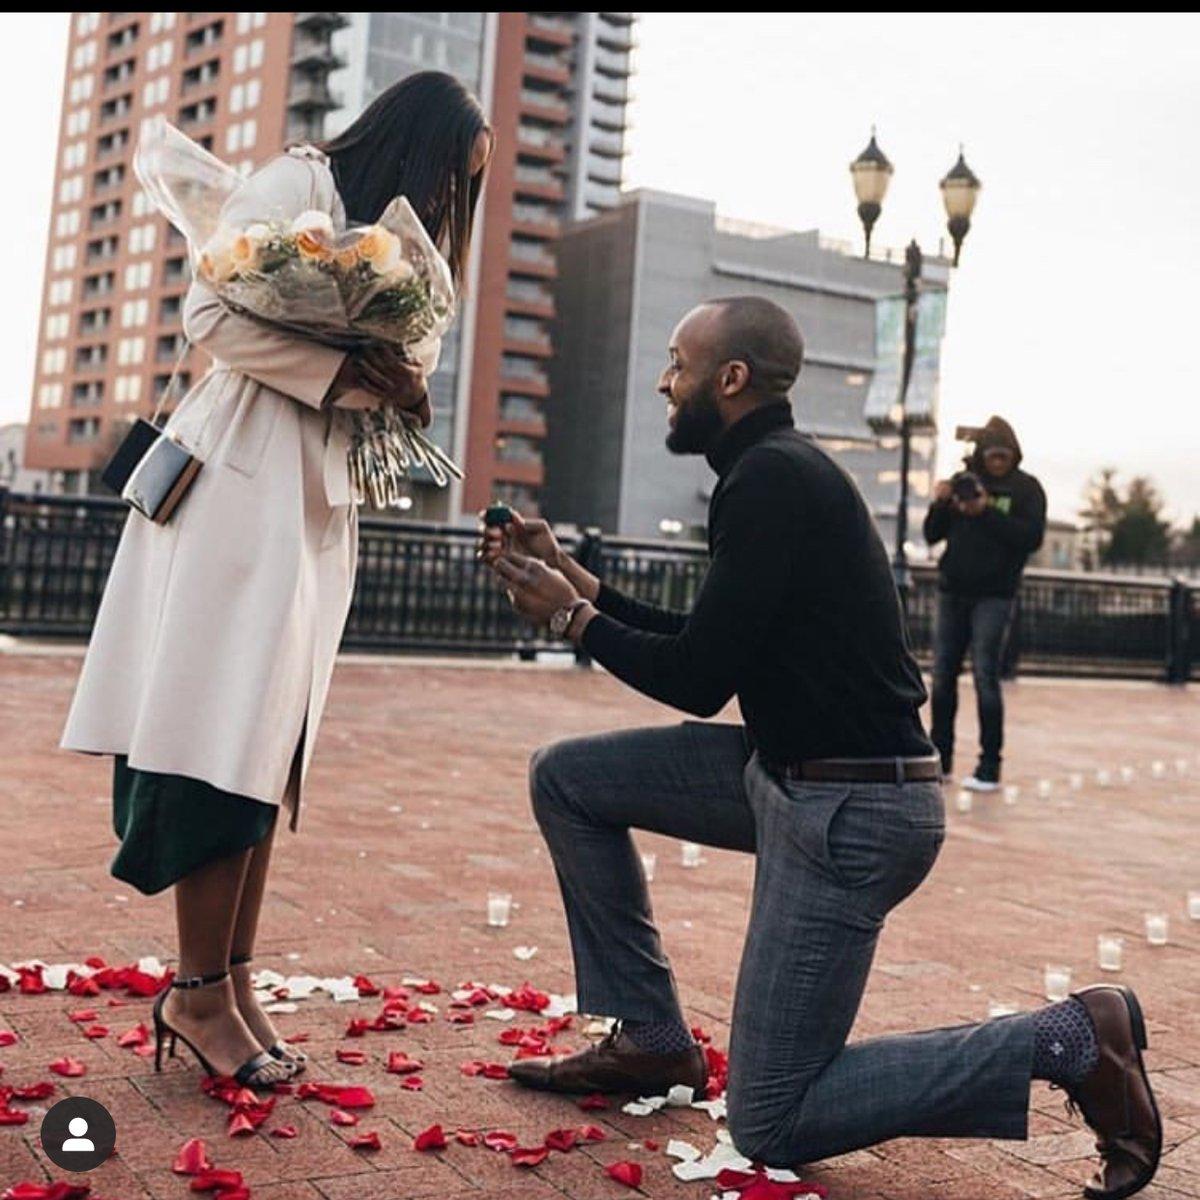 LUXE PROPOSAL:  @TheBlkBach  . . . .  #luxeapproved #luxewedding #luxekurves #luxebride #lifestyle #lafw #nyfw #wedding #weddingvibes #womenpic.twitter.com/BqfyFANwKm